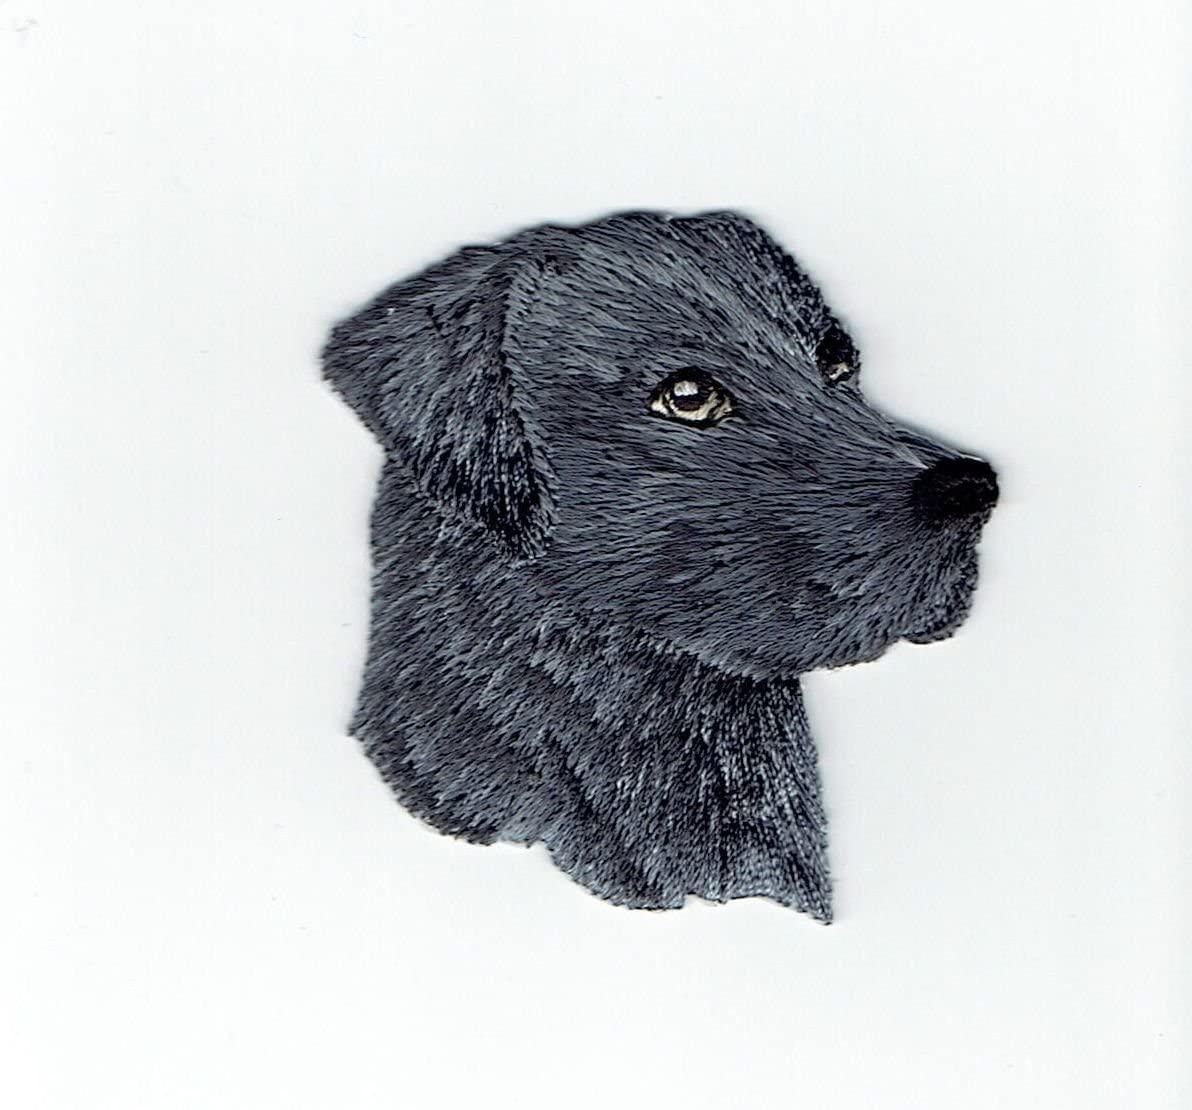 Black Lab - Head - Dog - Pets - Labrador Retriever - Iron on Embroidered Patch Applique